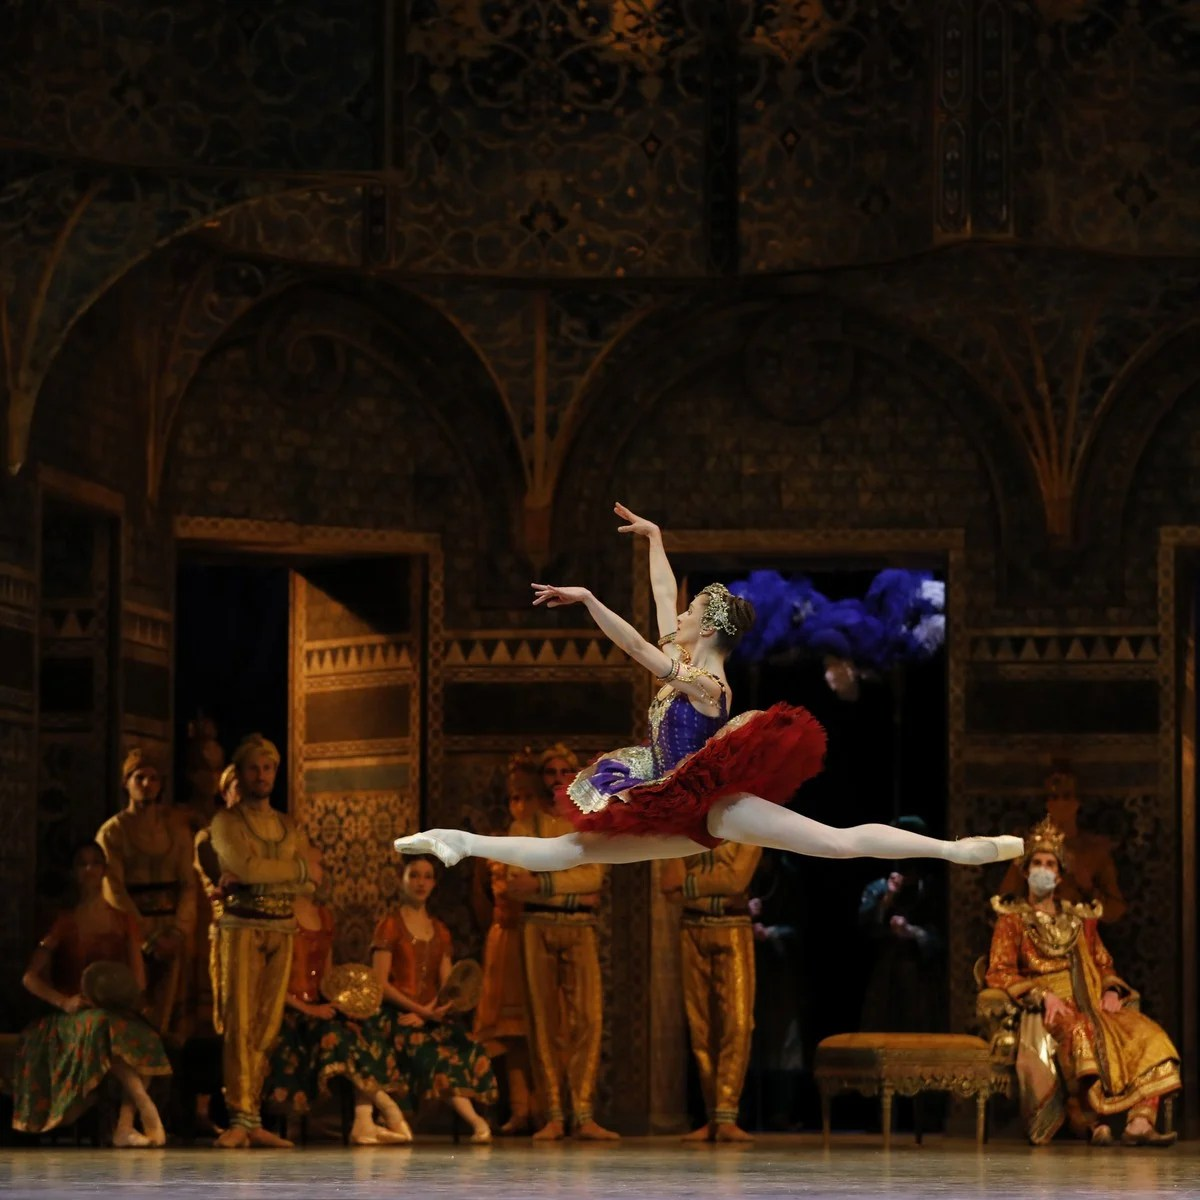 La bayadère with Valentine Colasante as Gamzatti, photo by Svetlana Loboff, OnP